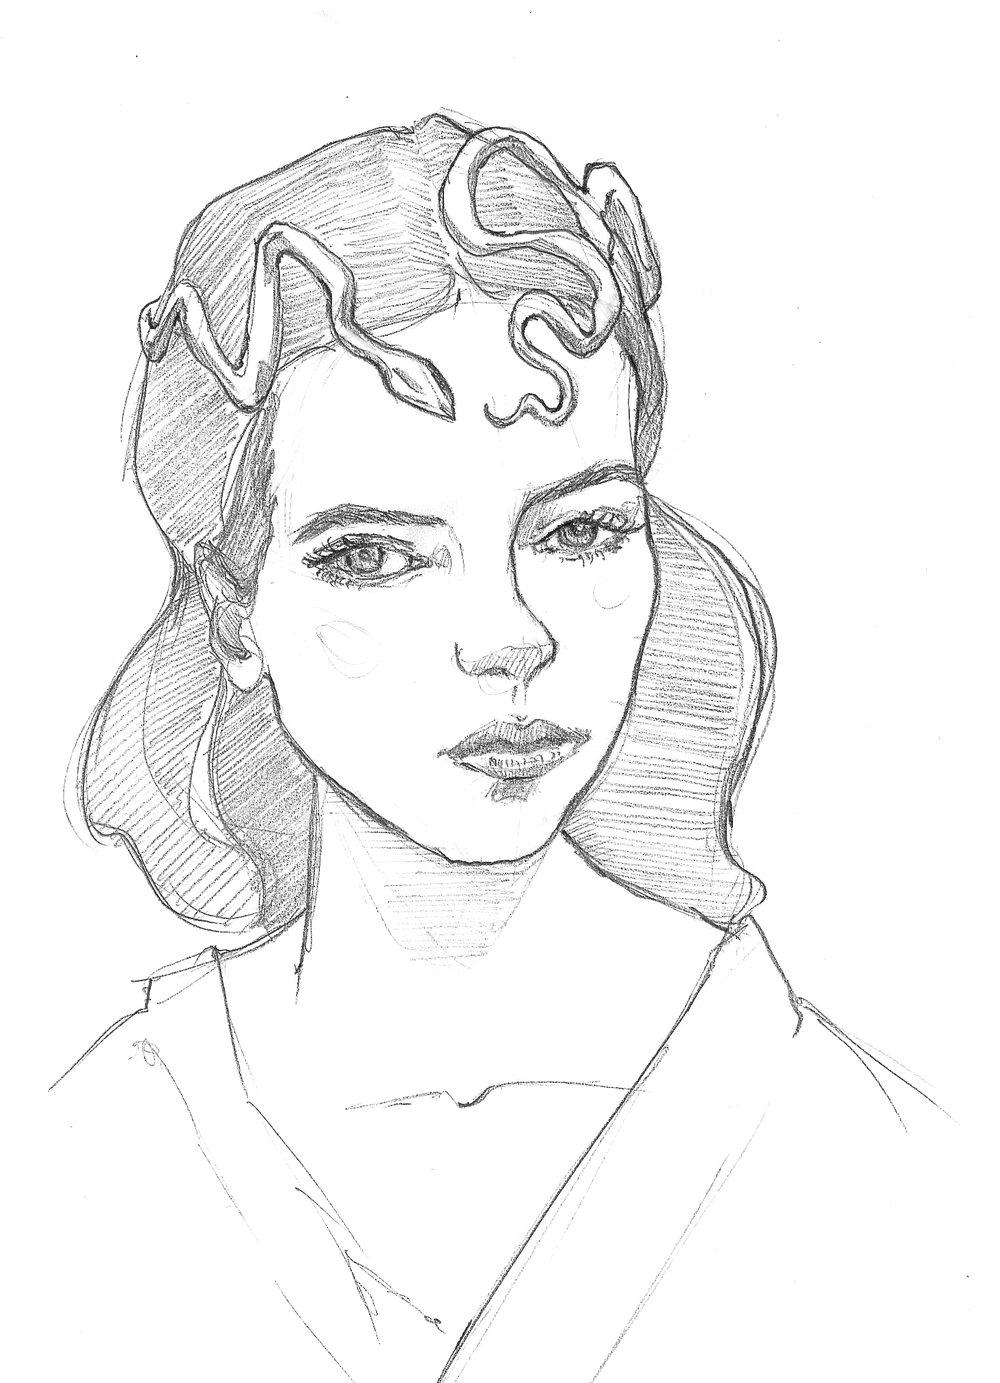 valentino sketch077 2.jpg